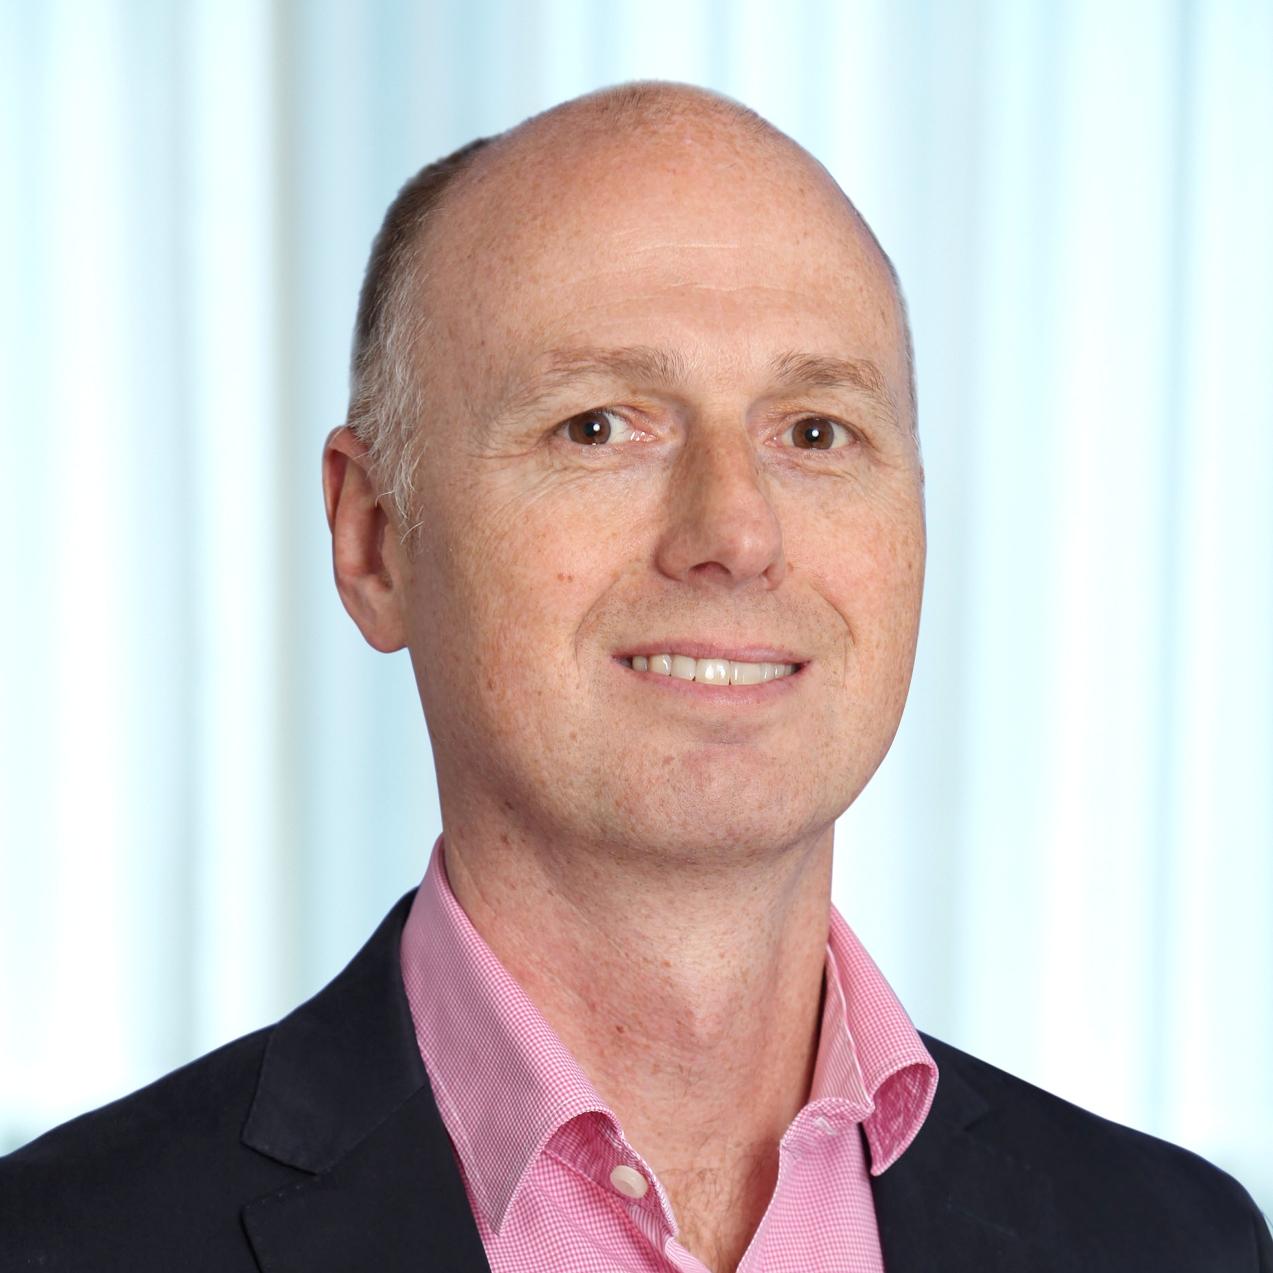 Richard Robinson VP Commercial - Cambridge Analytica